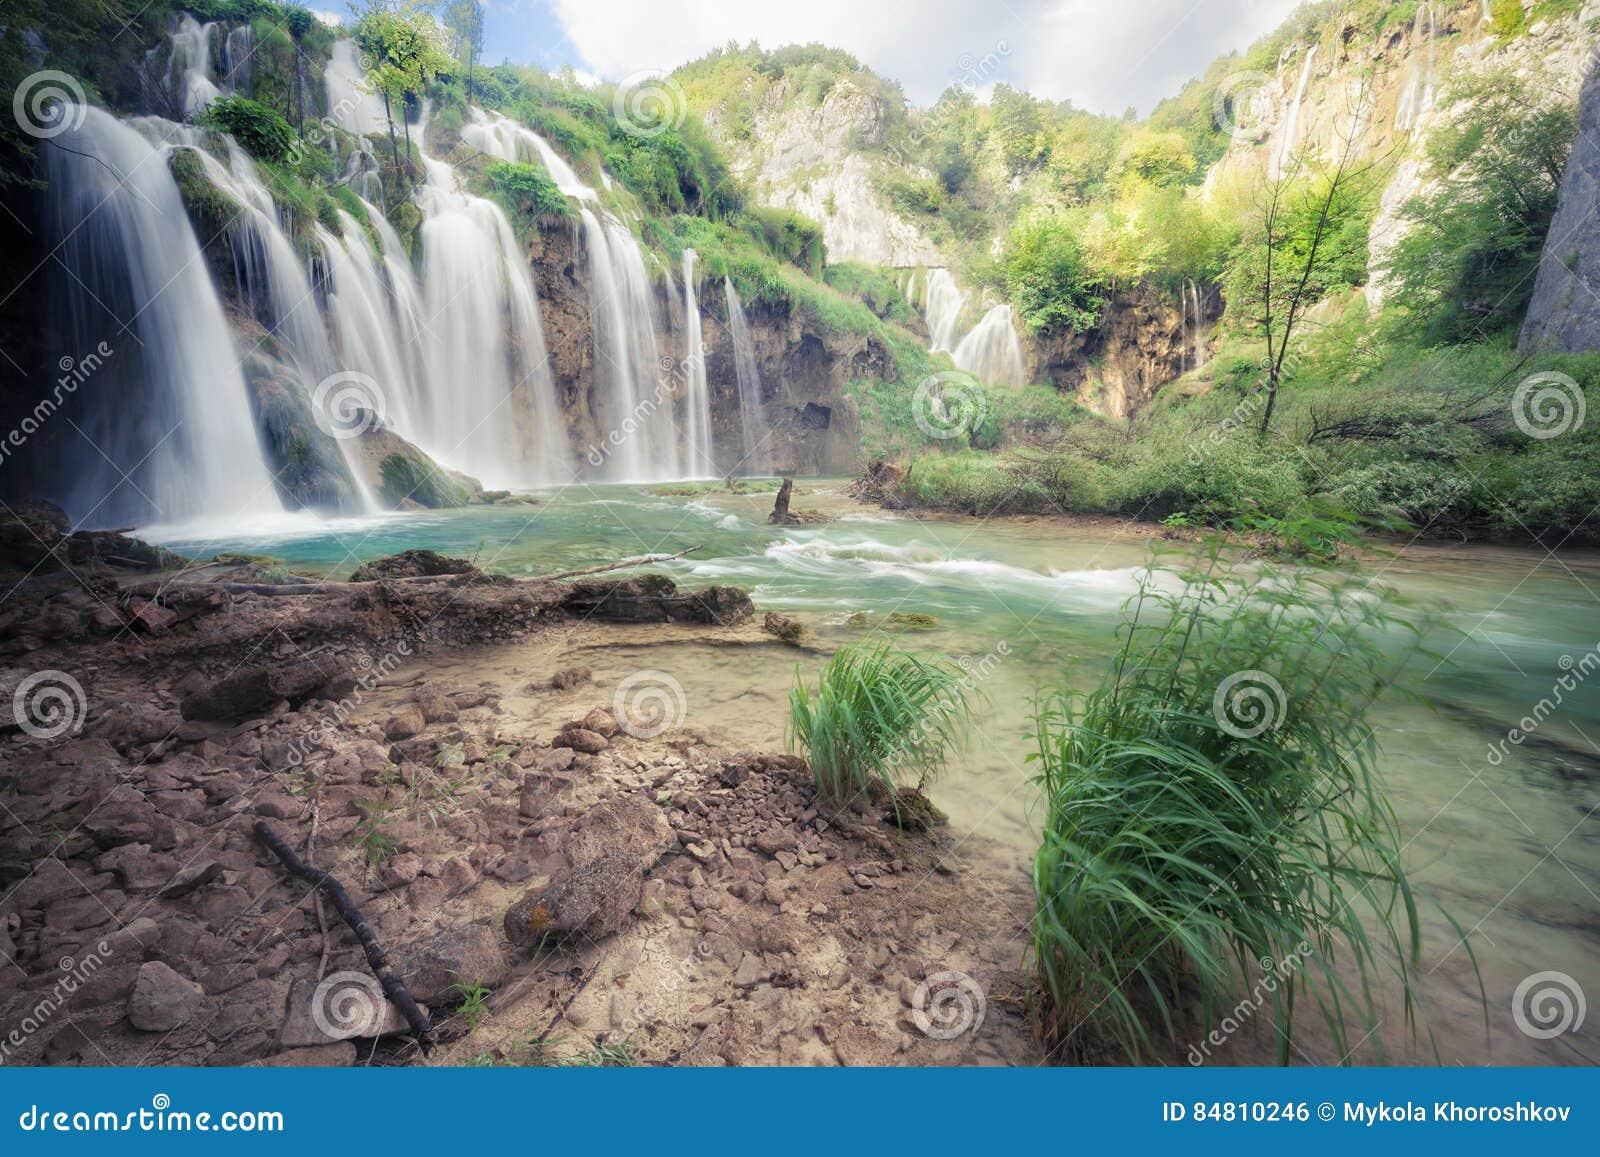 Download Beautiful Tropical Waterfall Stock Photo - Image of background, footbridge: 84810246